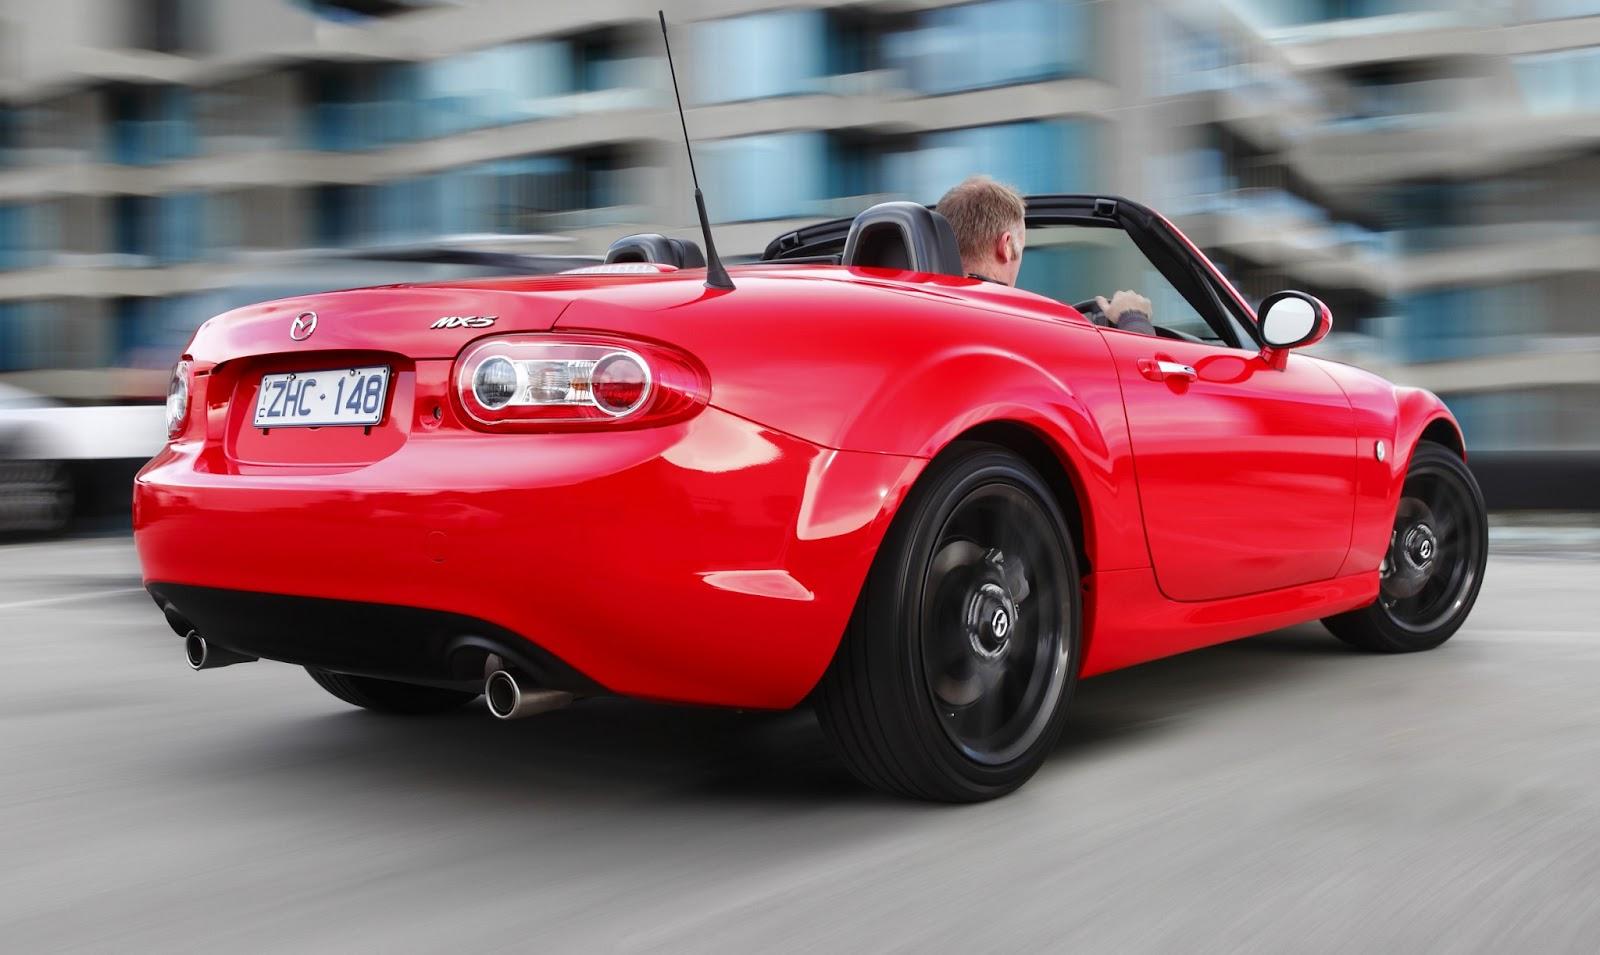 Cool Car Wallpapers: Mazda Cars 2013